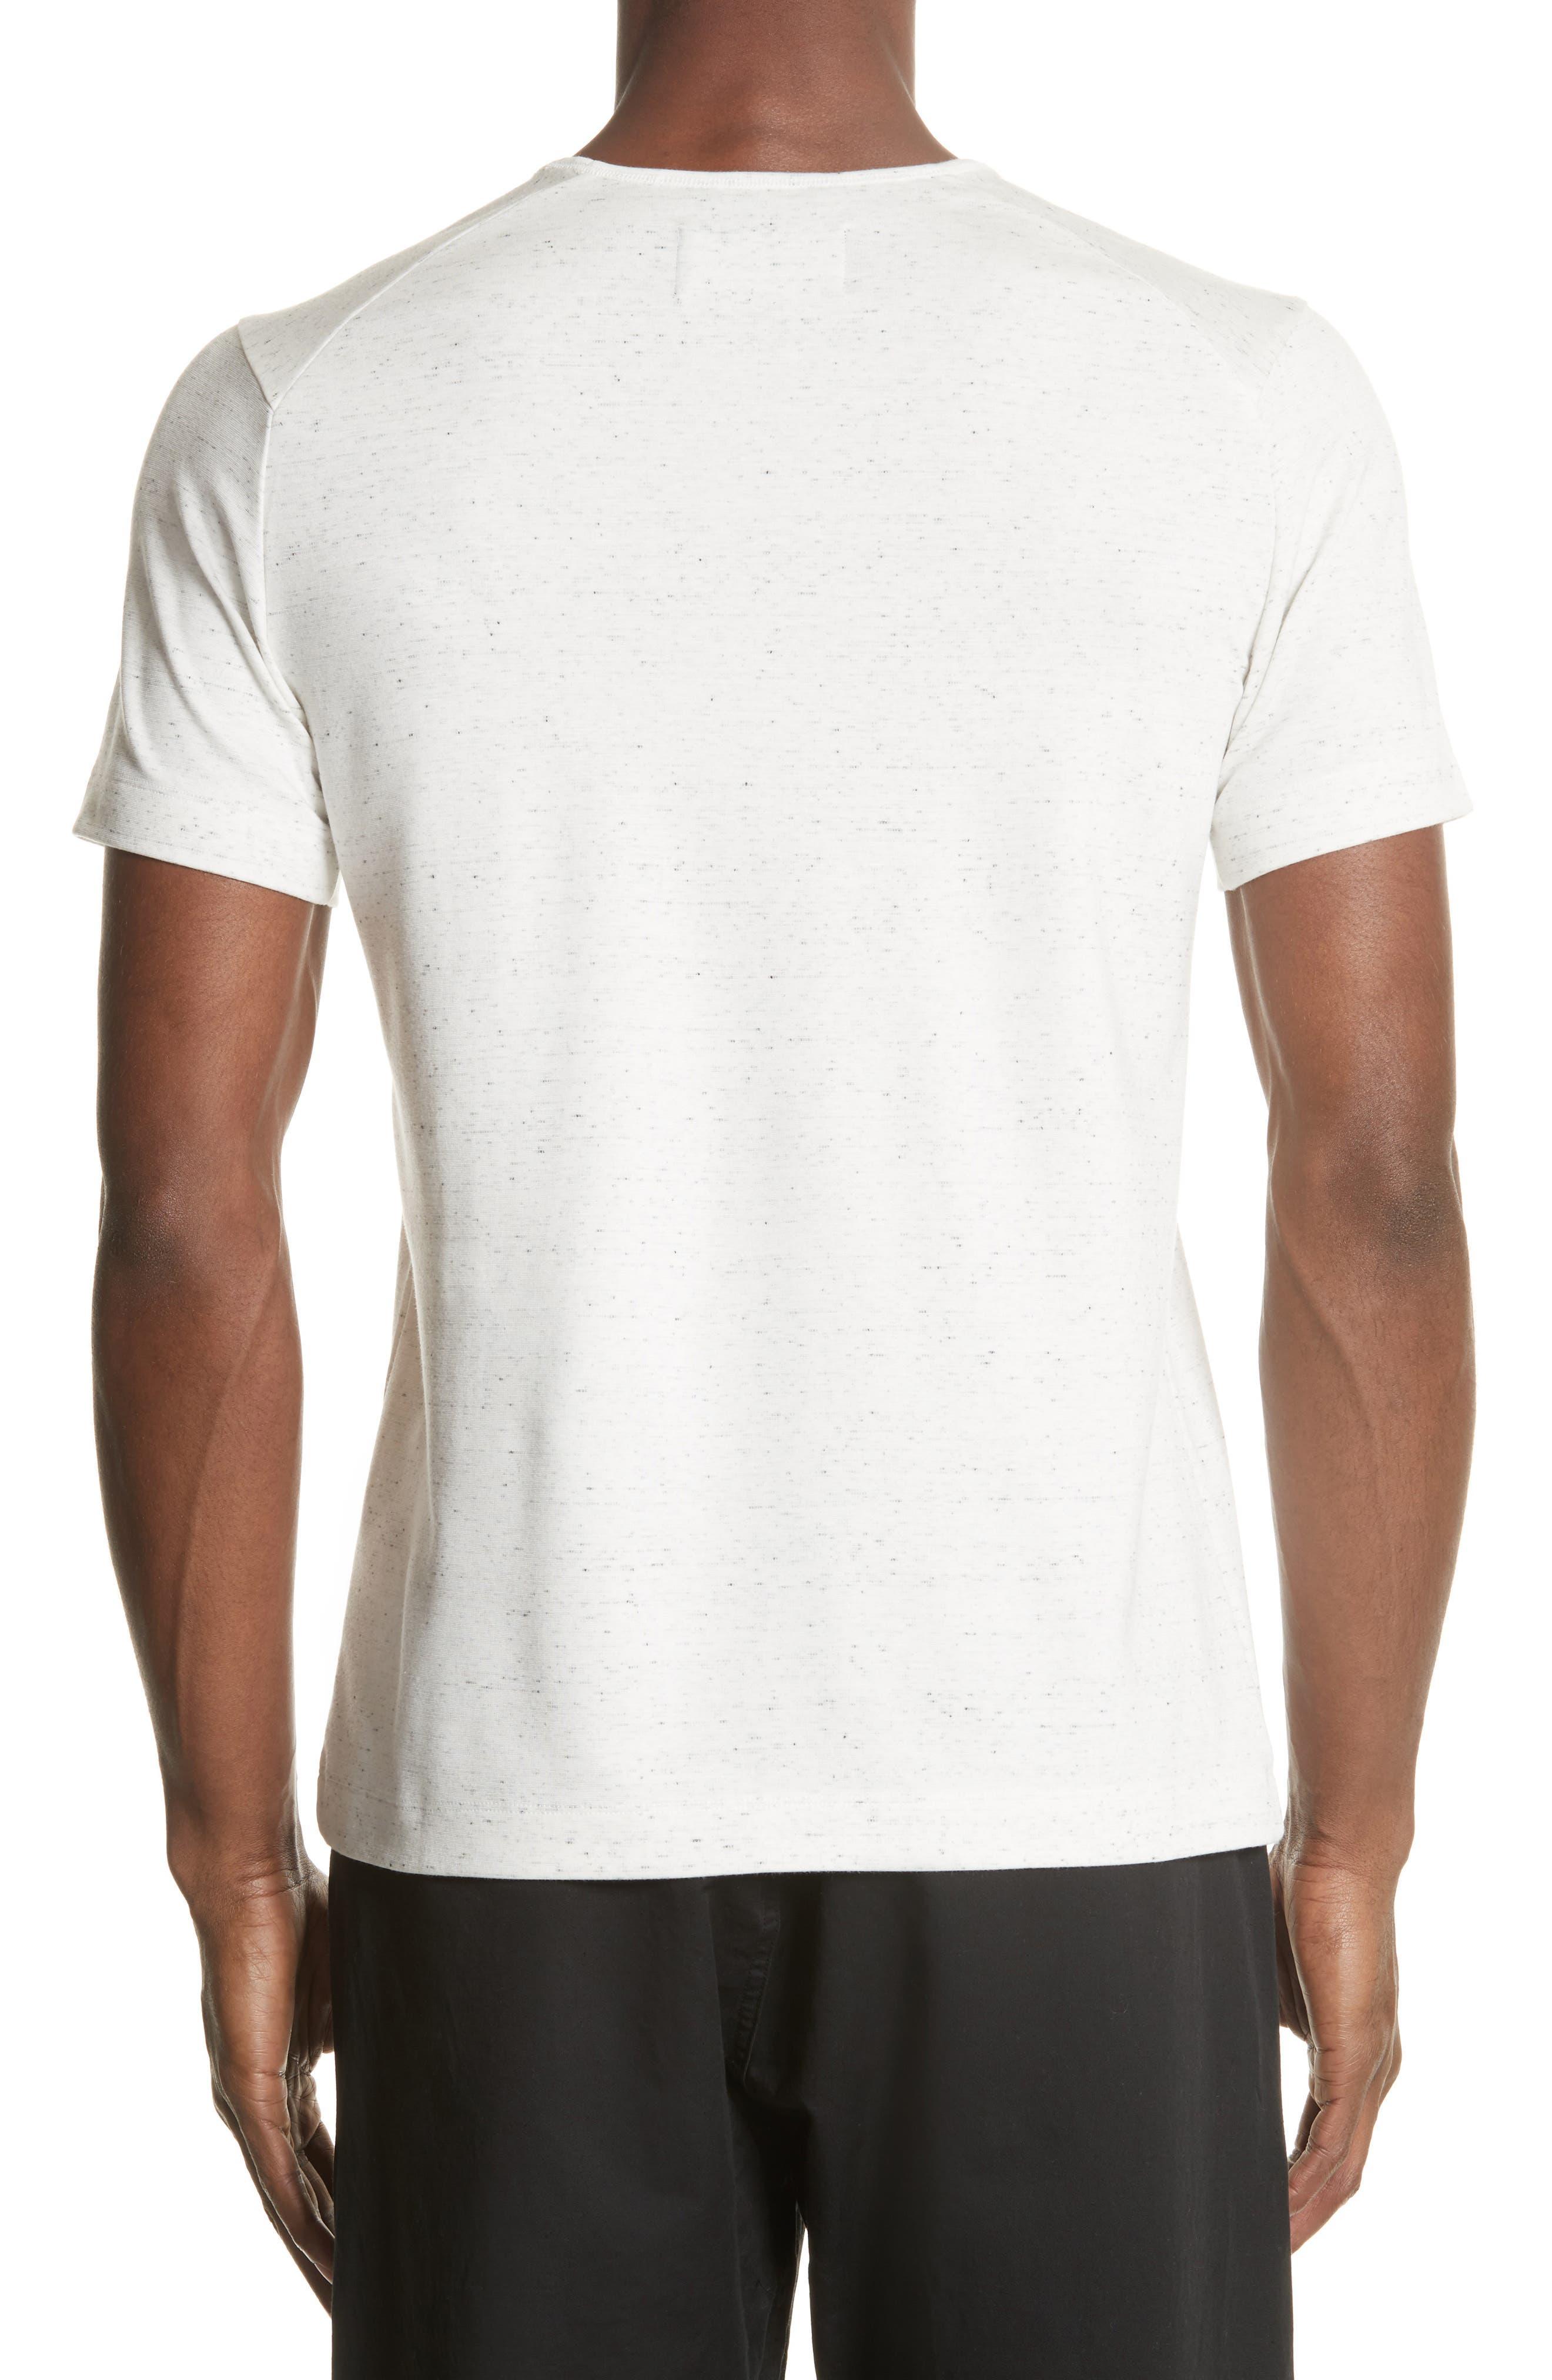 Signals T-Shirt,                             Alternate thumbnail 2, color,                             Static White